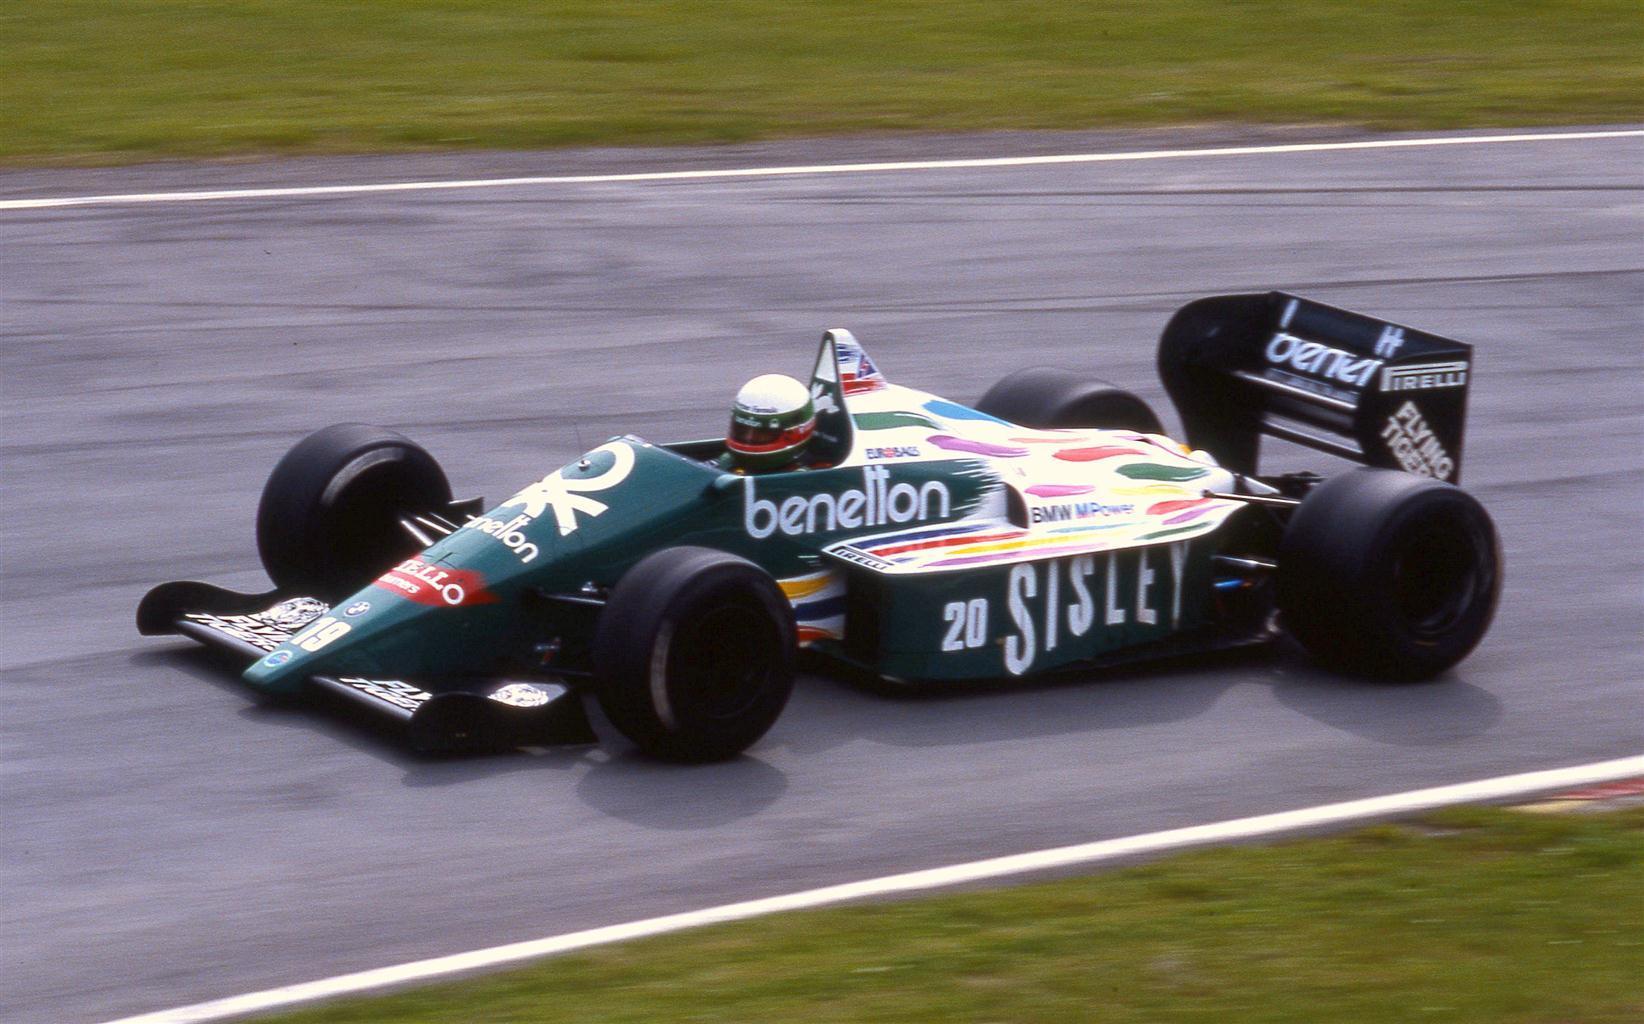 Teo Fabi 1986 Benetton